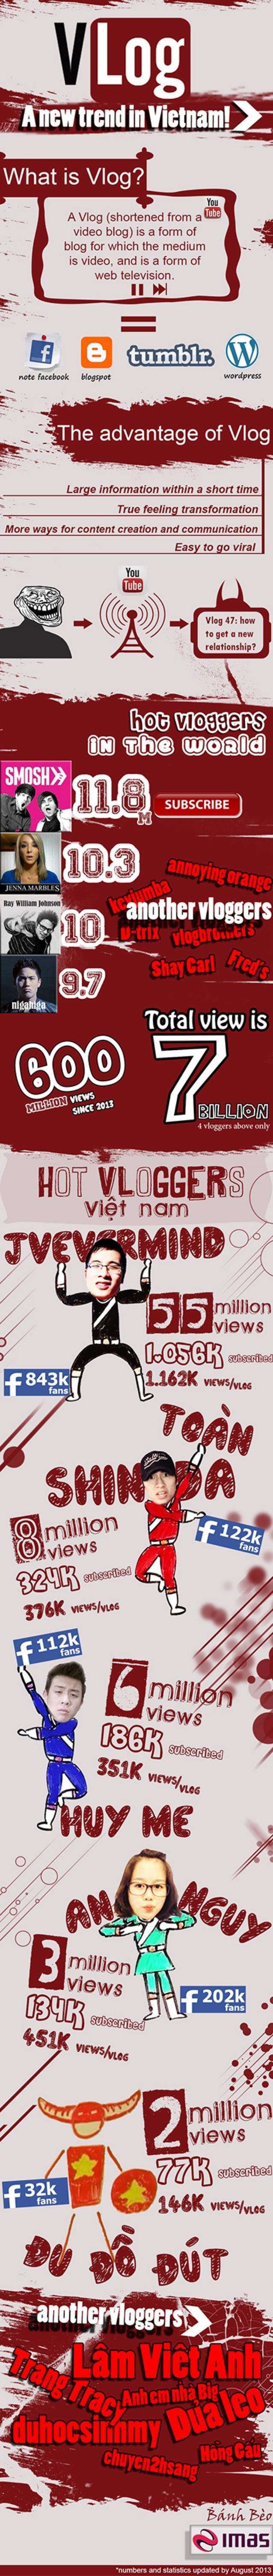 Vlog infographic eng2